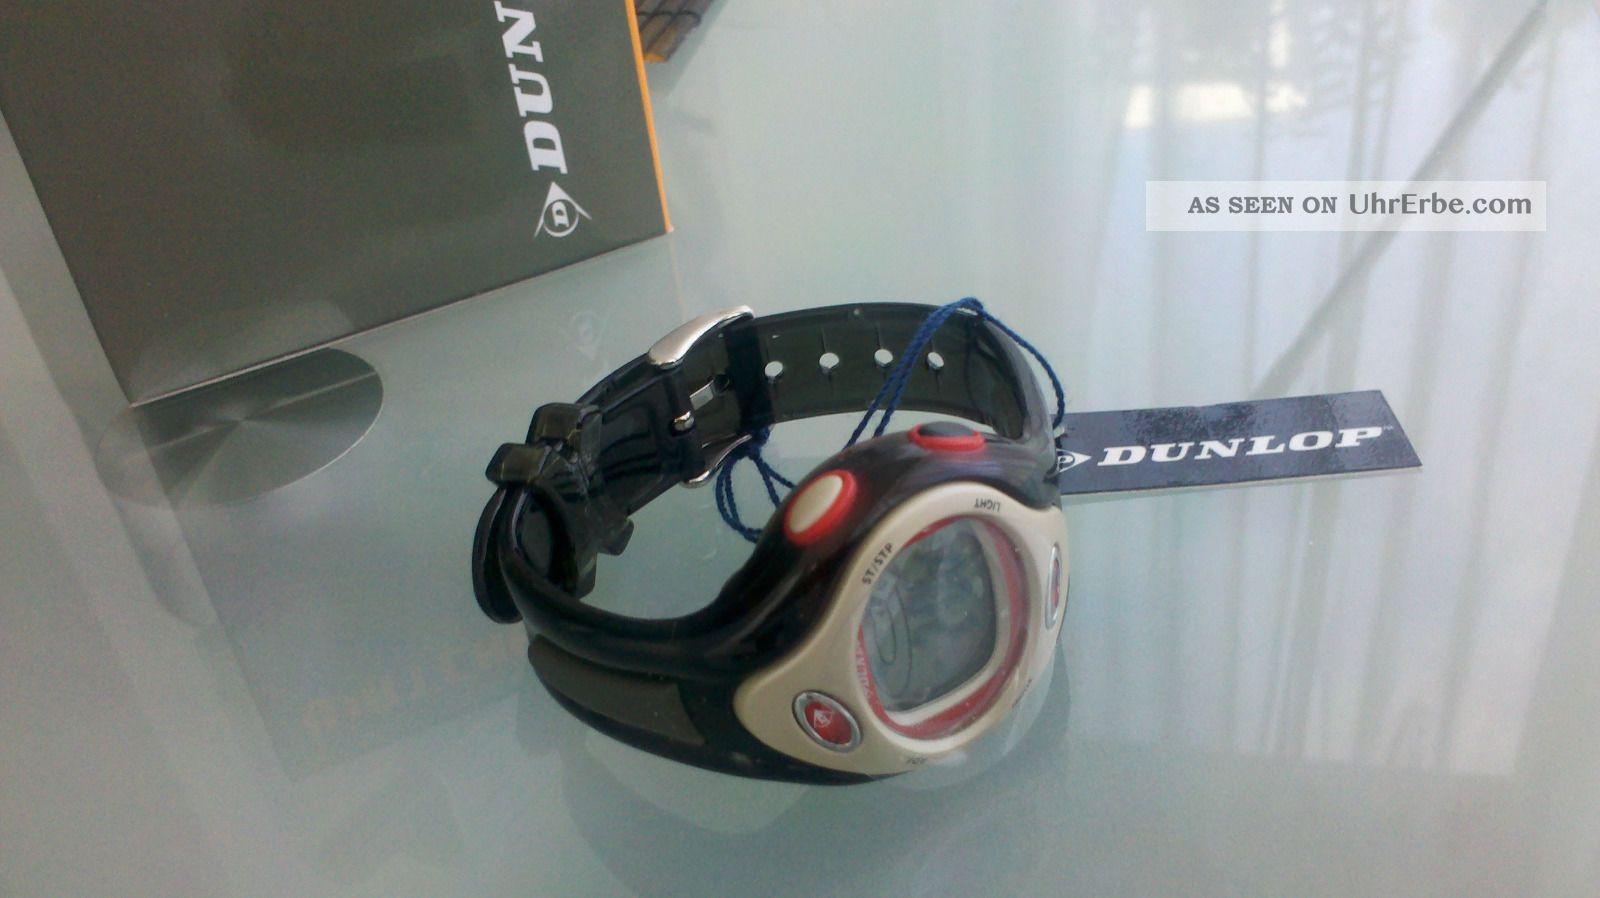 Damenuhr Dunlop Armbanduhren Bild